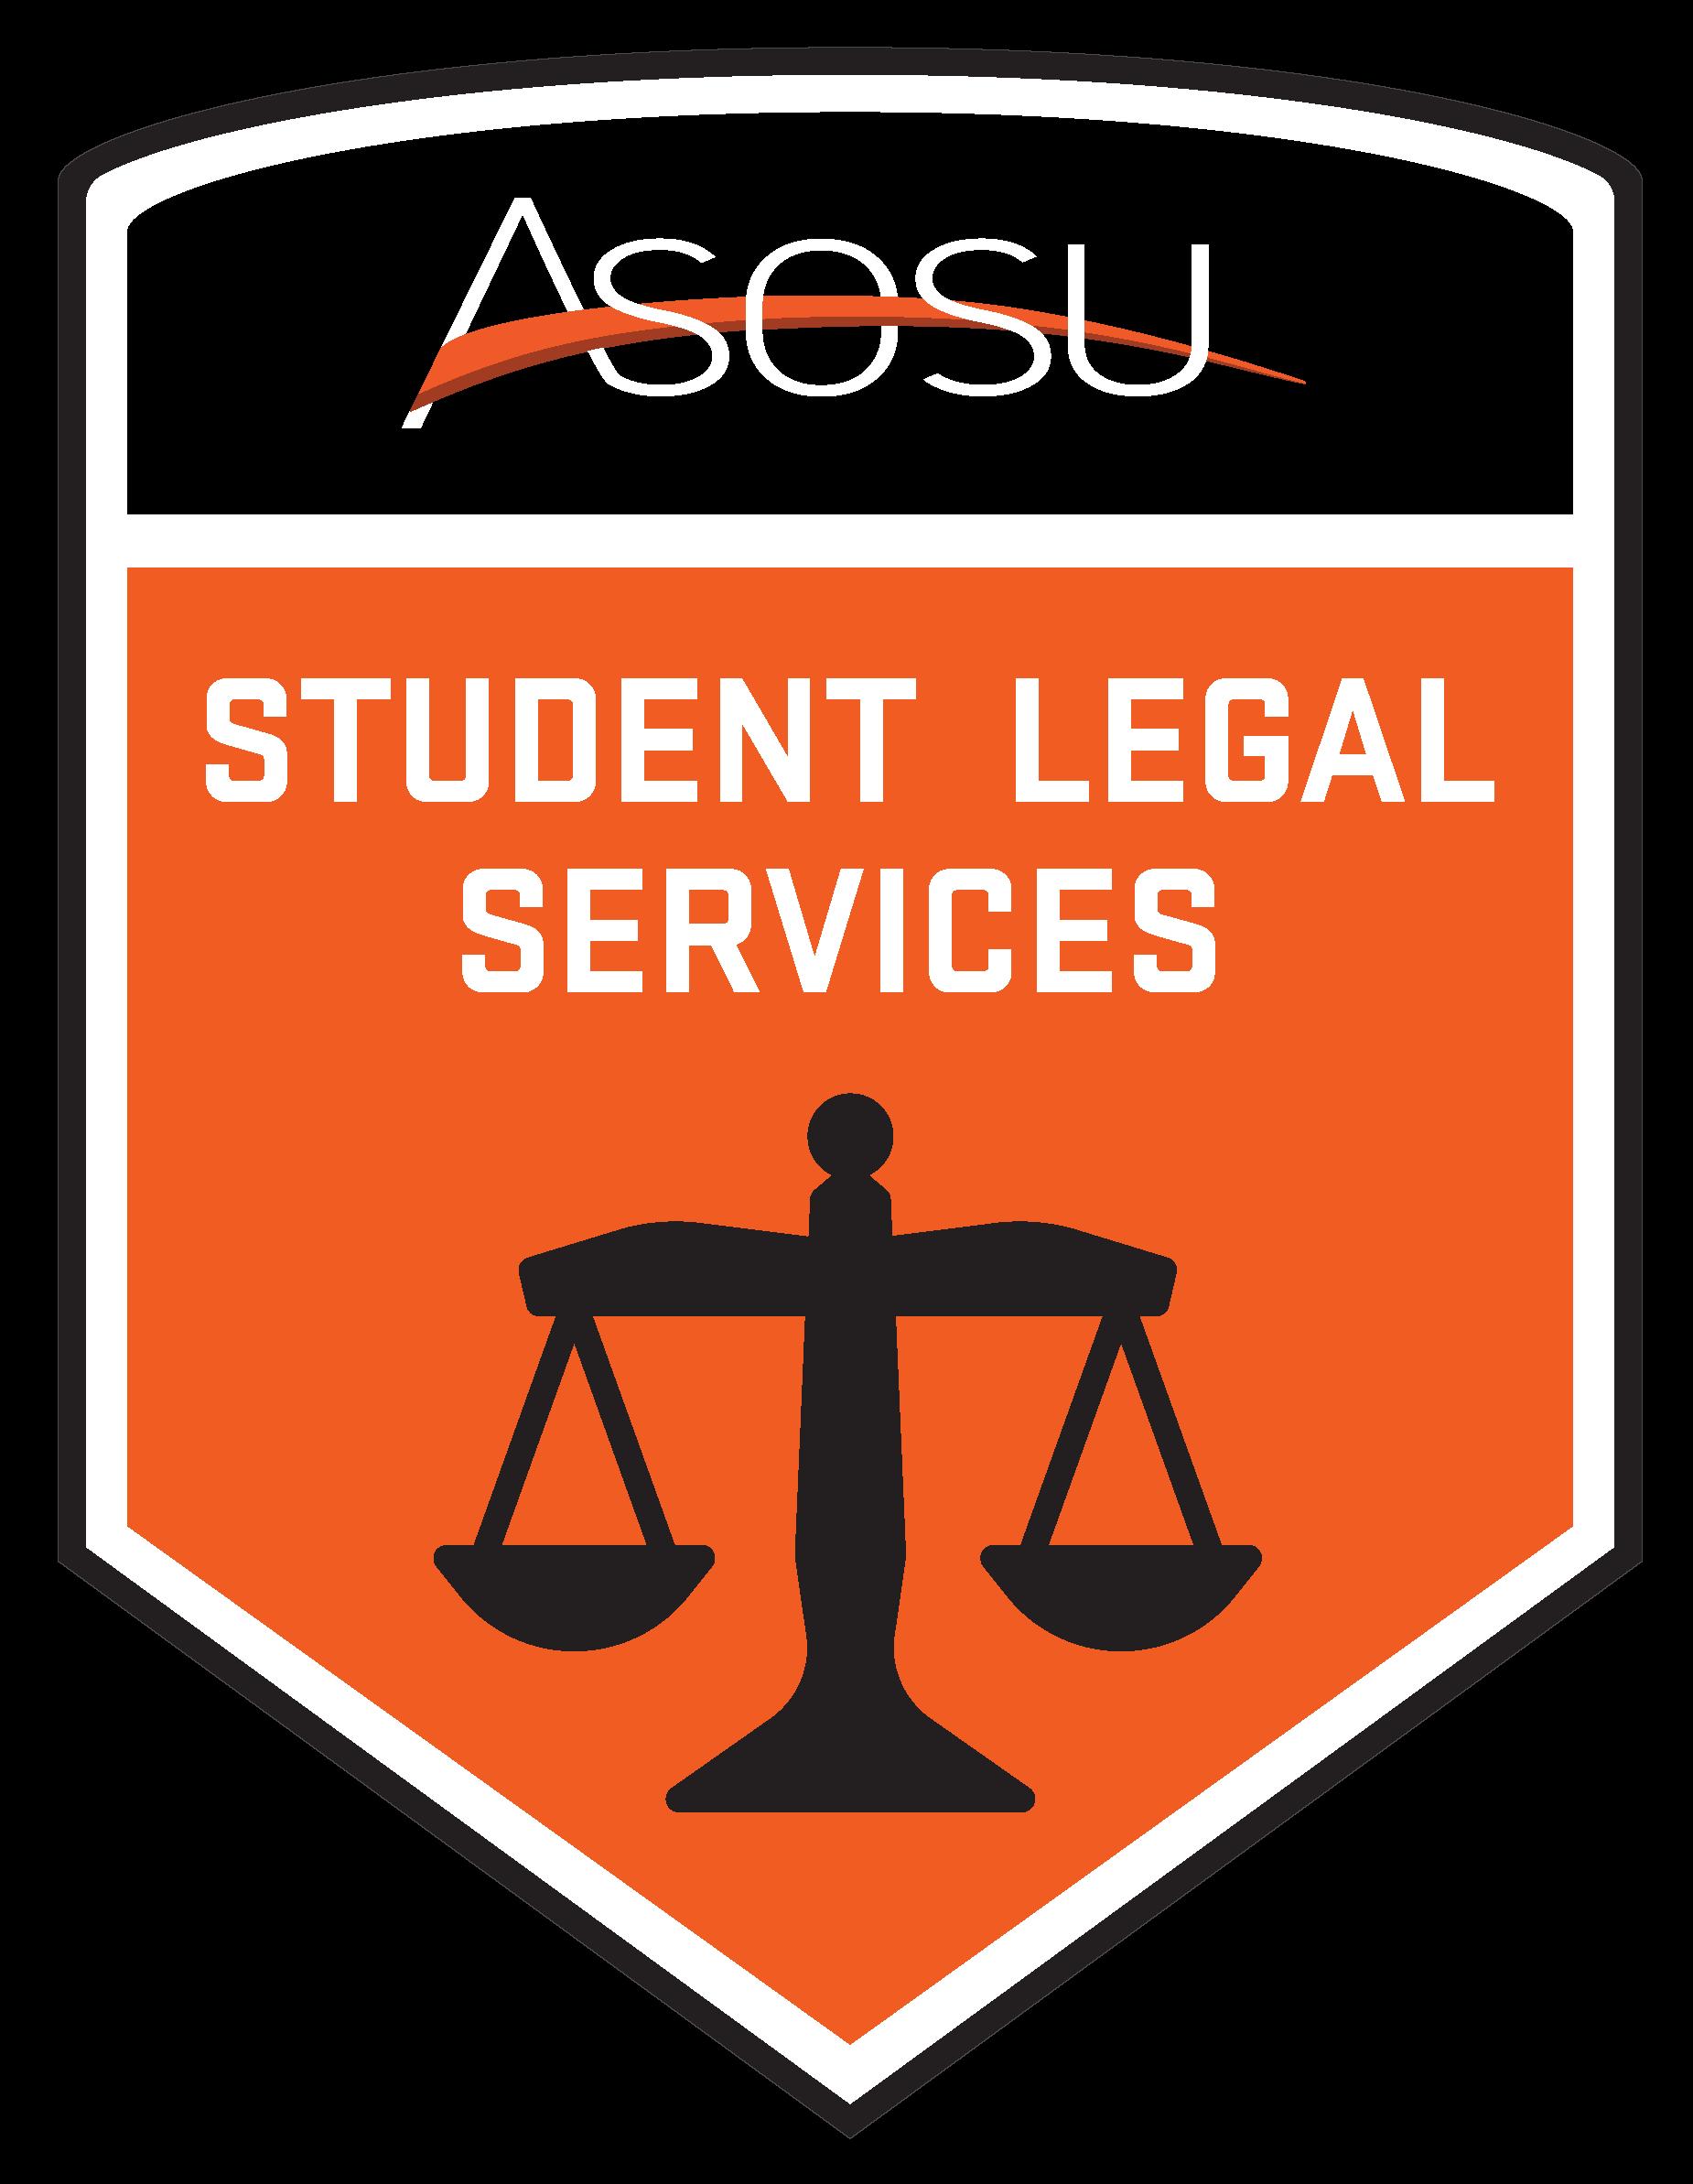 Oregon State University Maps, Asosu Student Legal Services, Oregon State University Maps